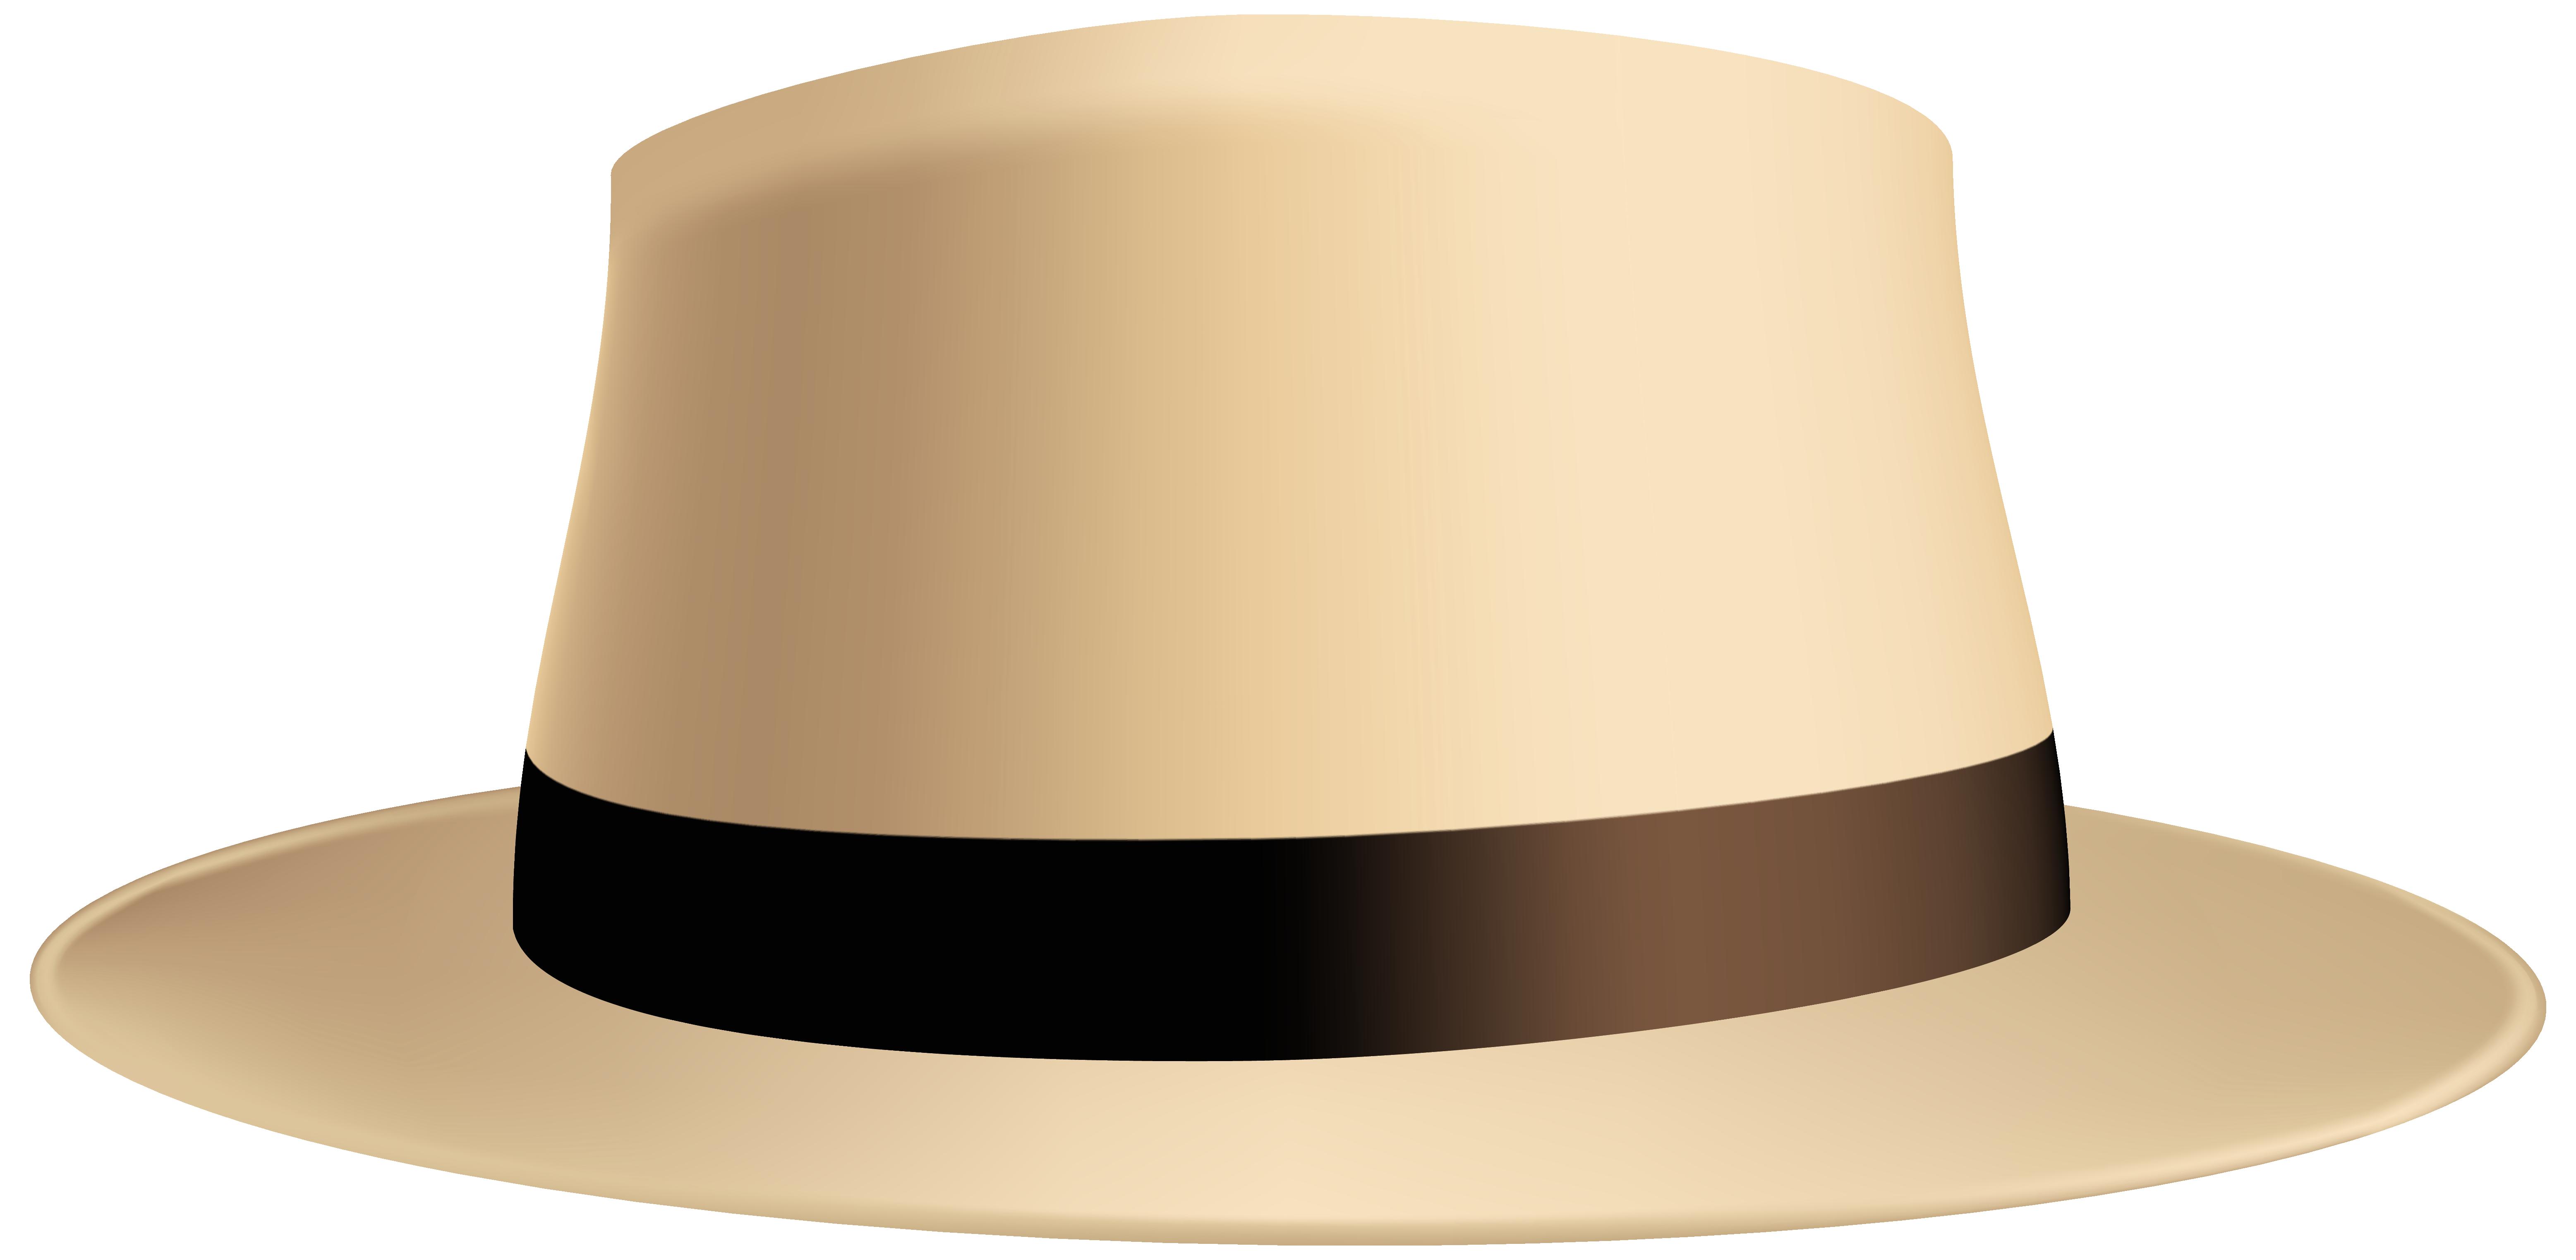 Male Summer Hat PNG Clip Art Image.